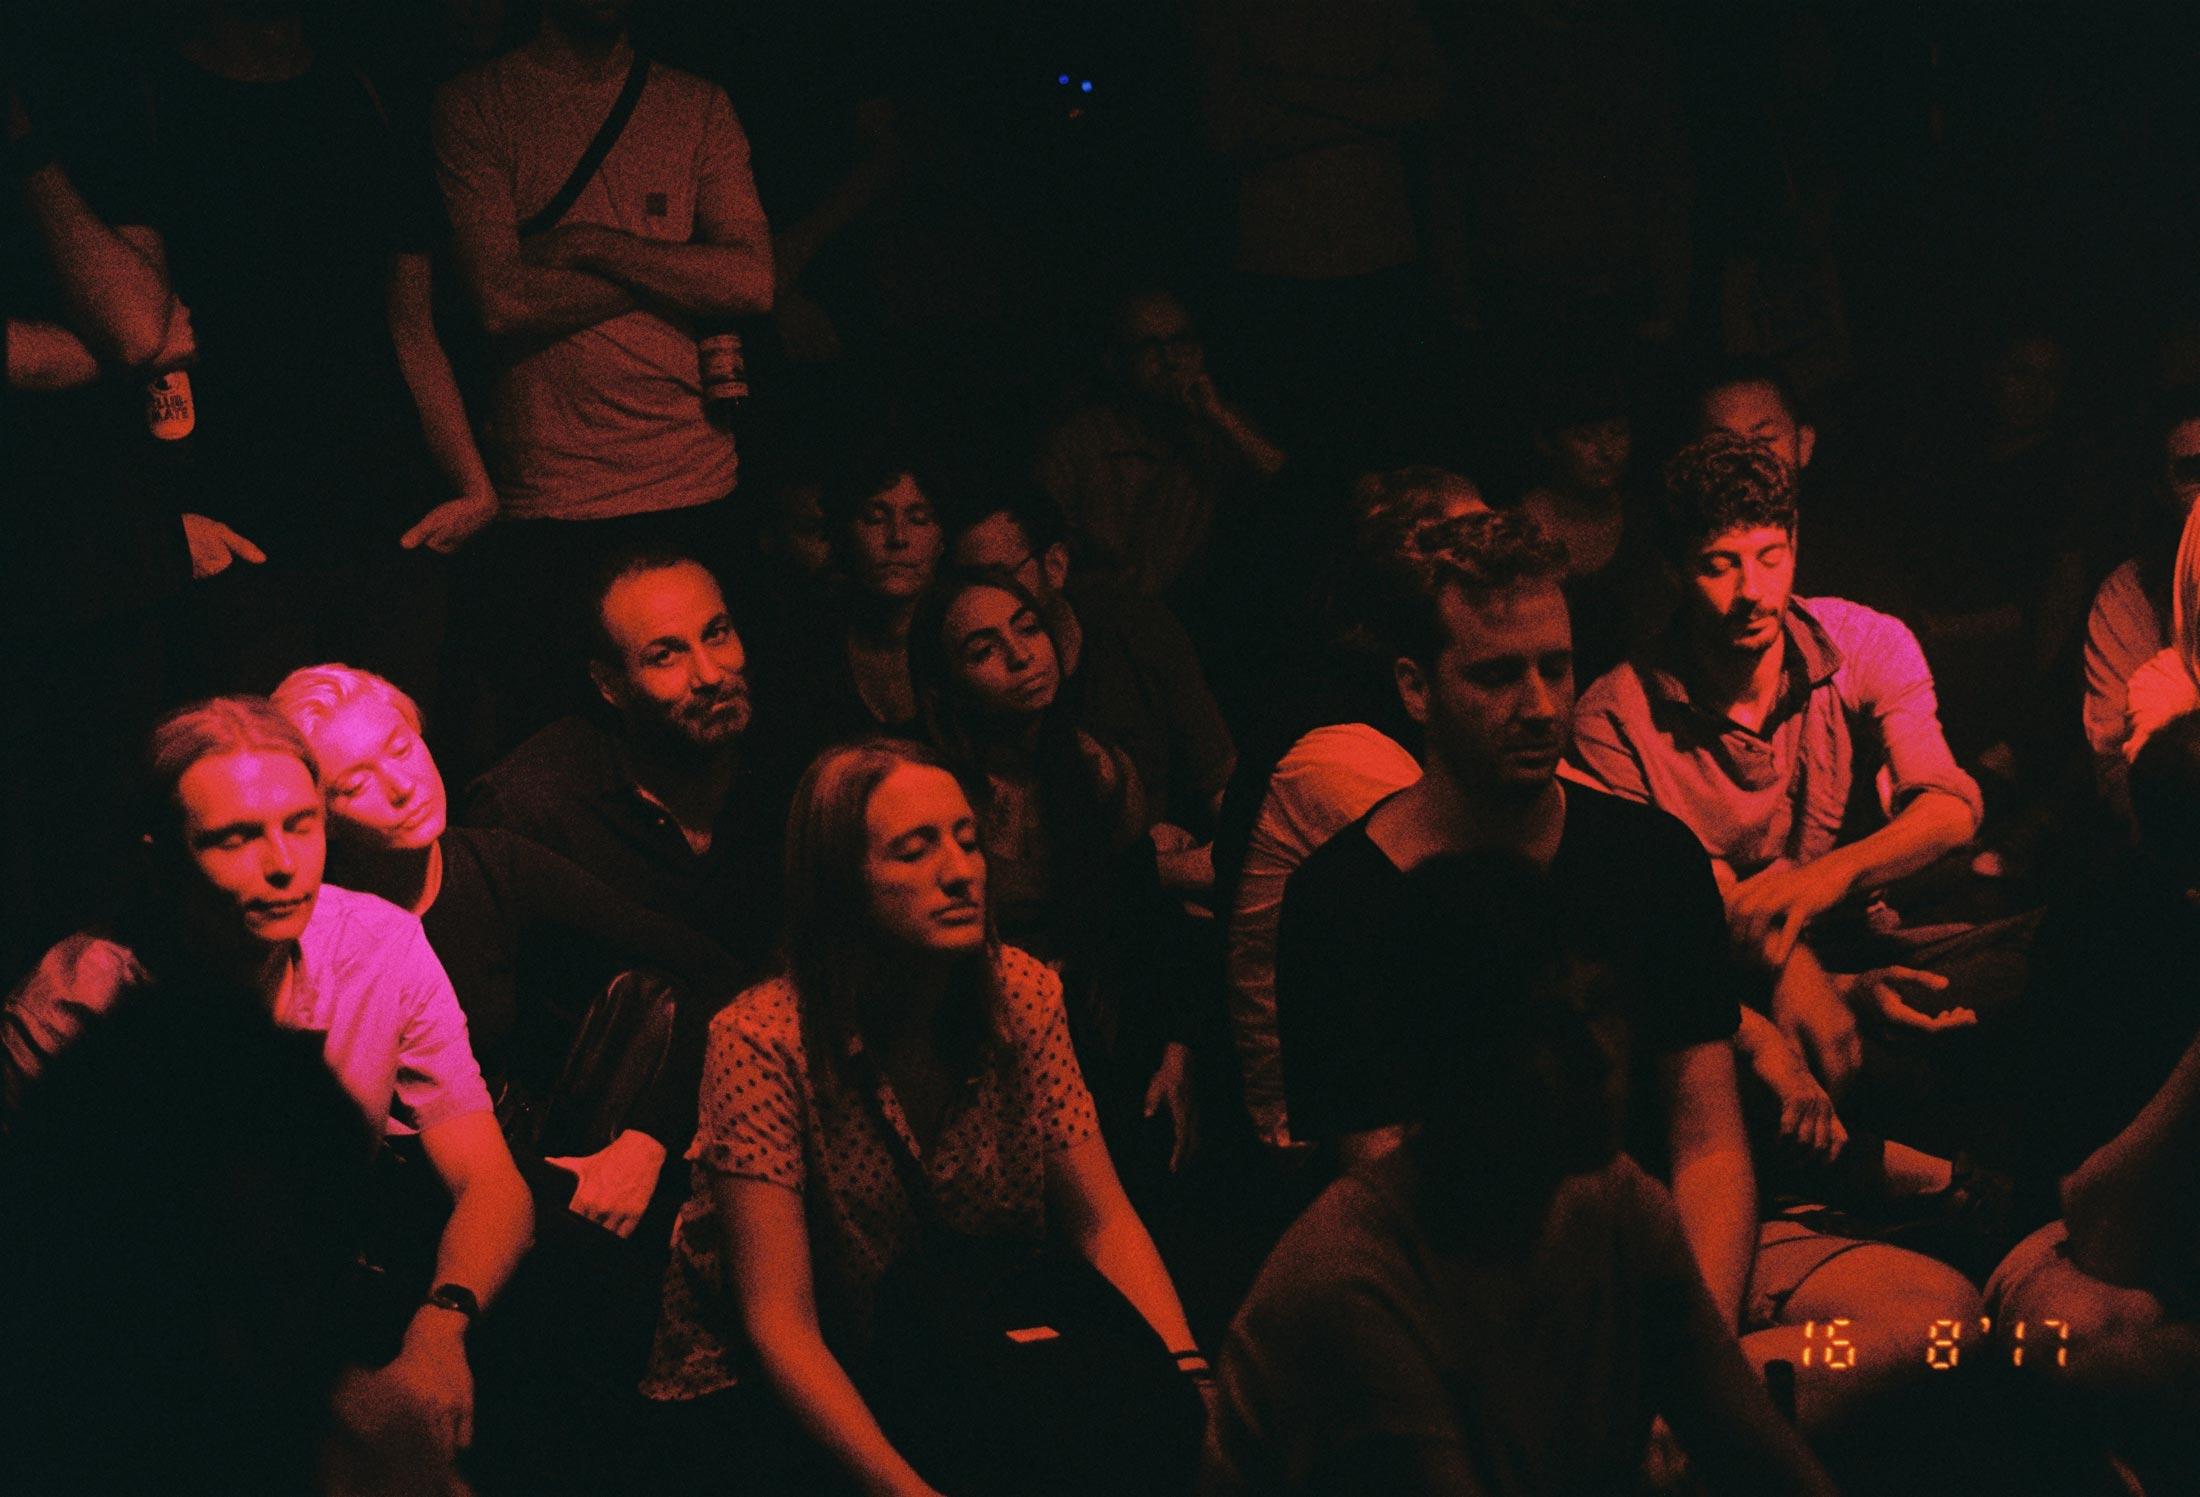 Ambient Gig Berlin Underground Techno Tresor Ohm Rave Nightlife